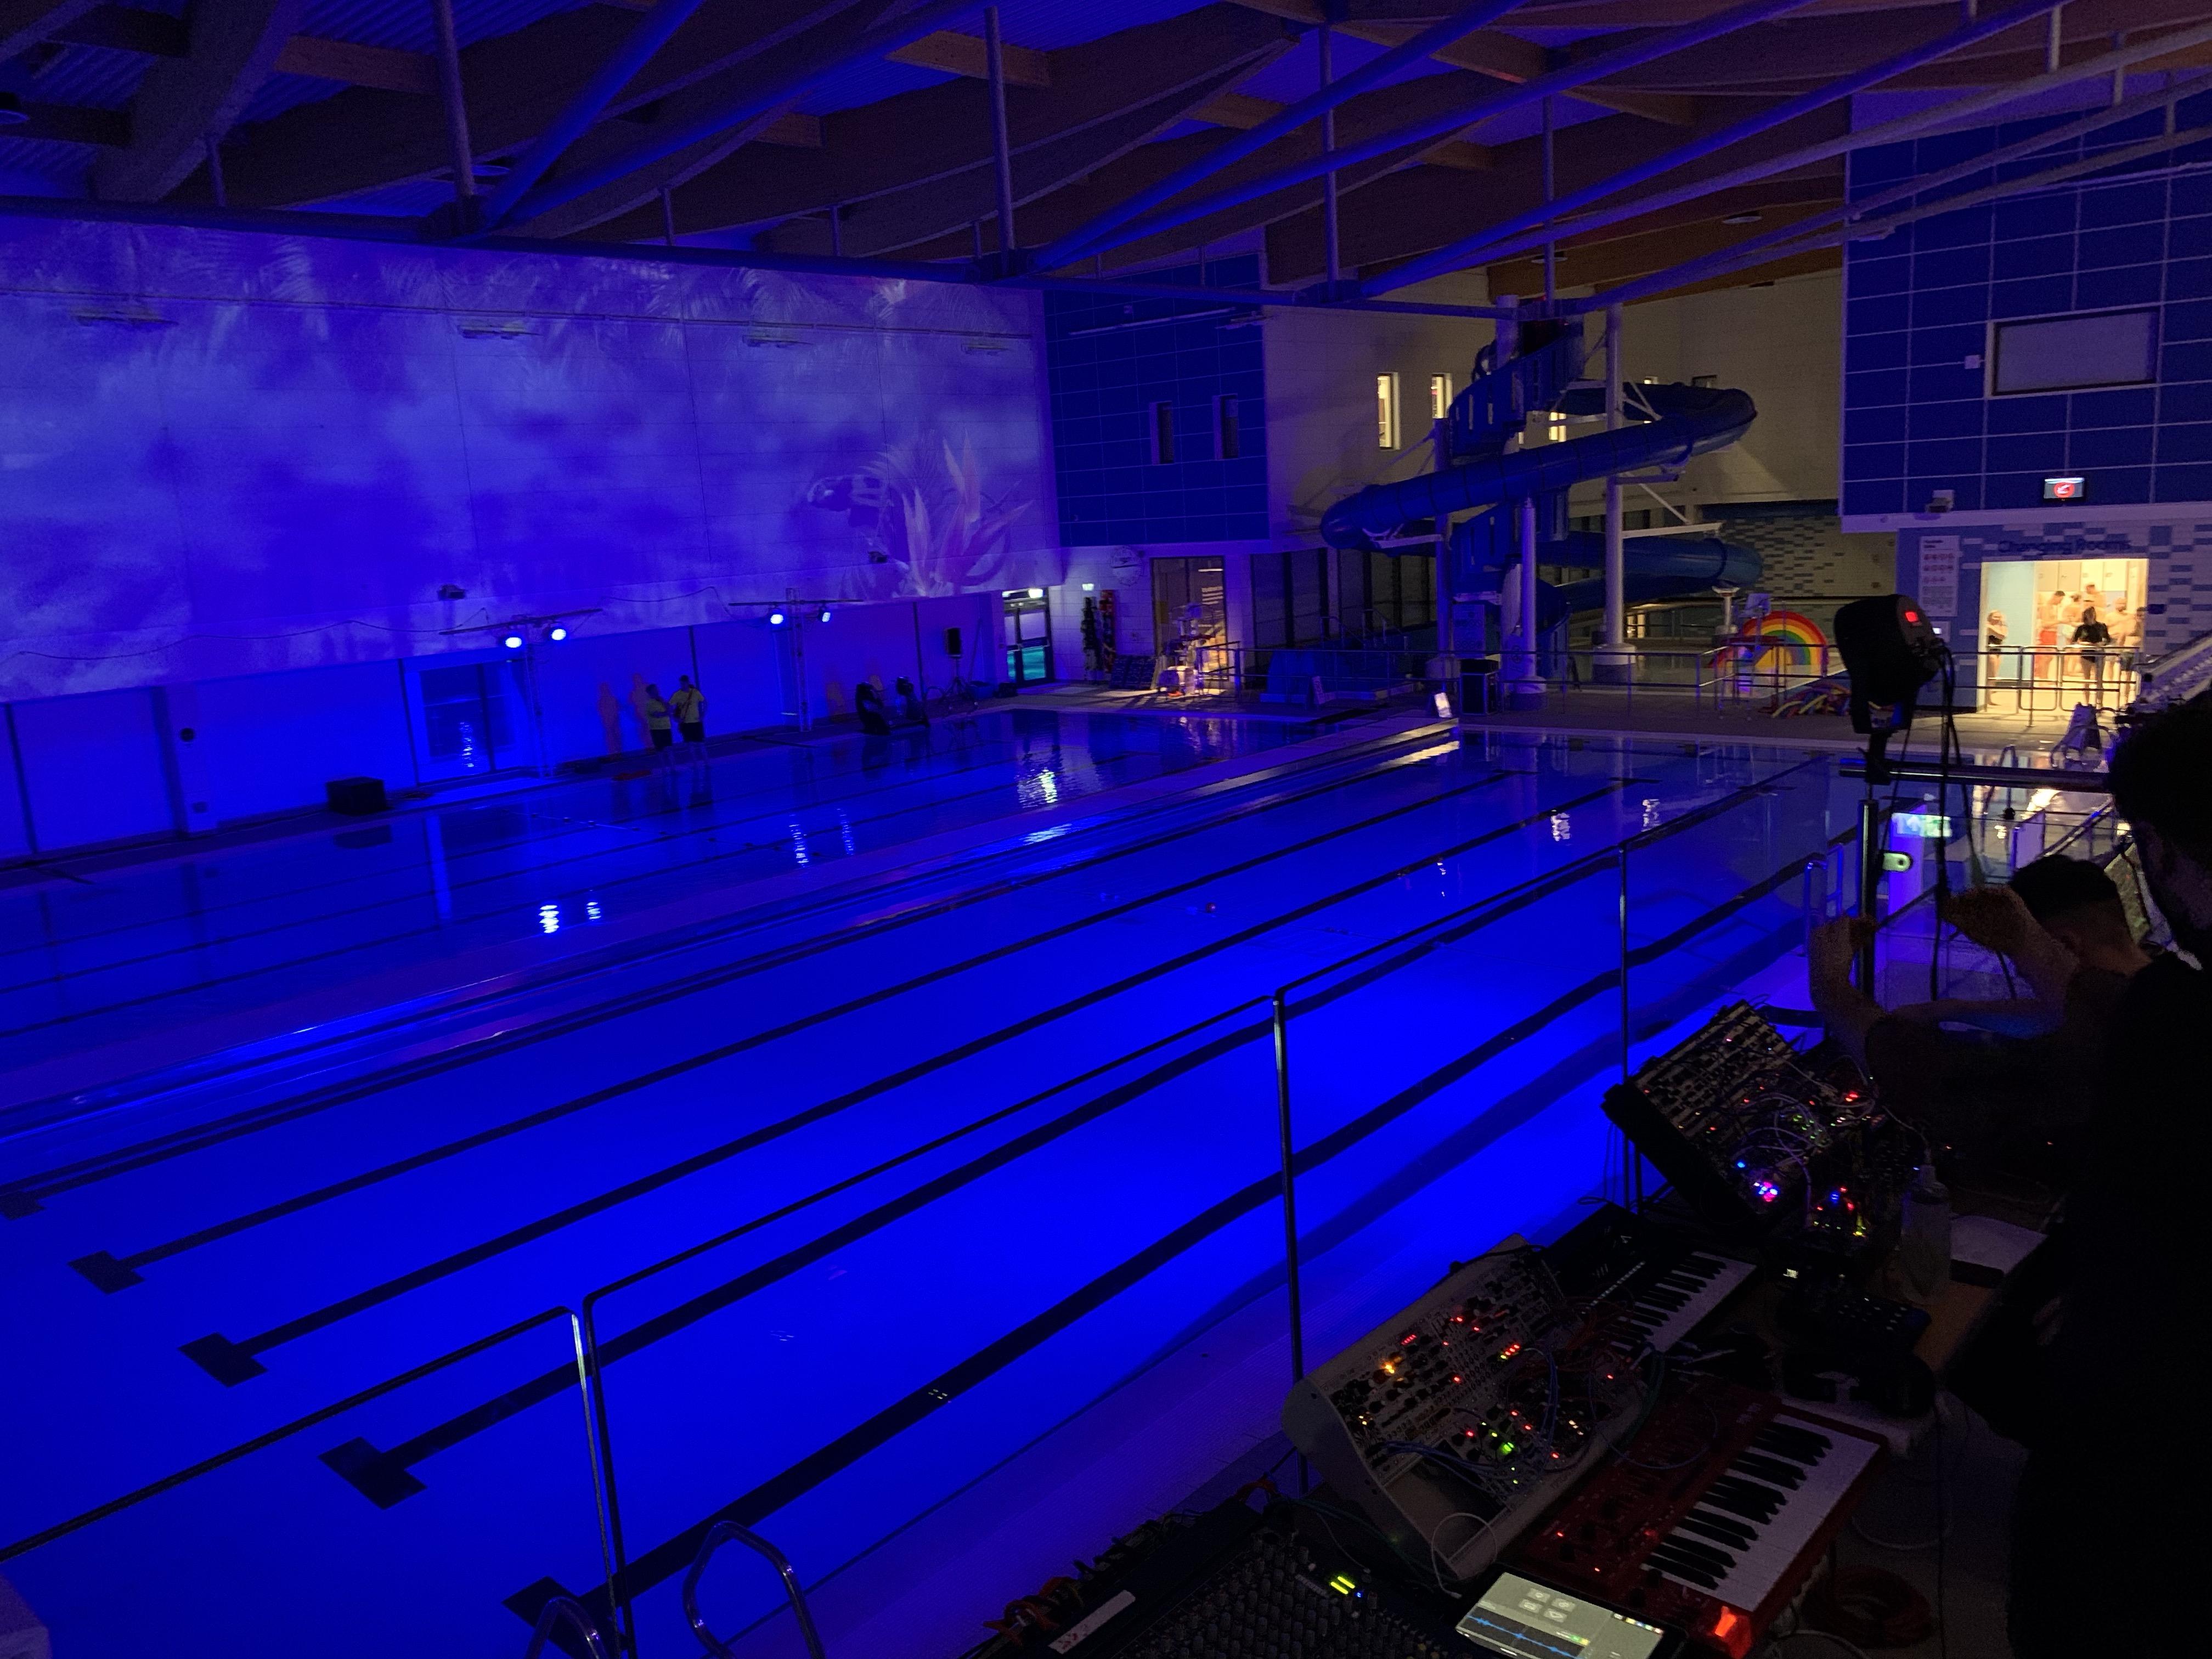 Swimming pool at night with purple lighting